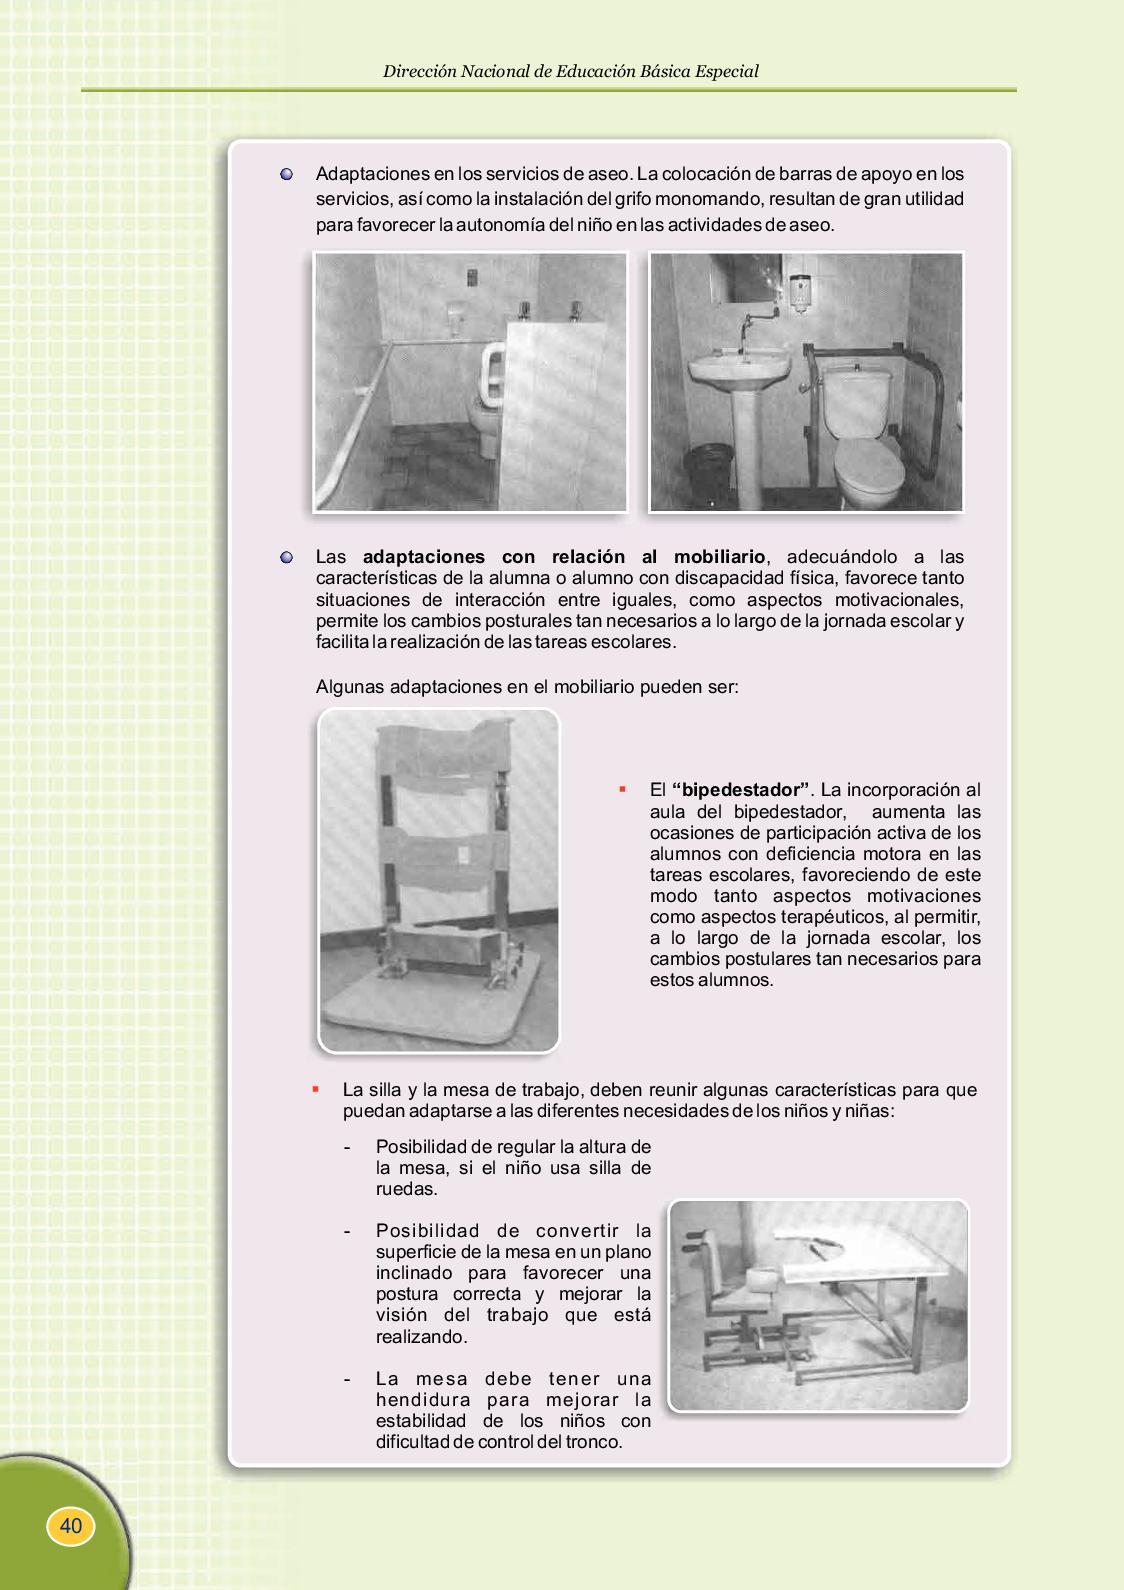 Manual Adaptaciones Curriculares Calameo Downloader